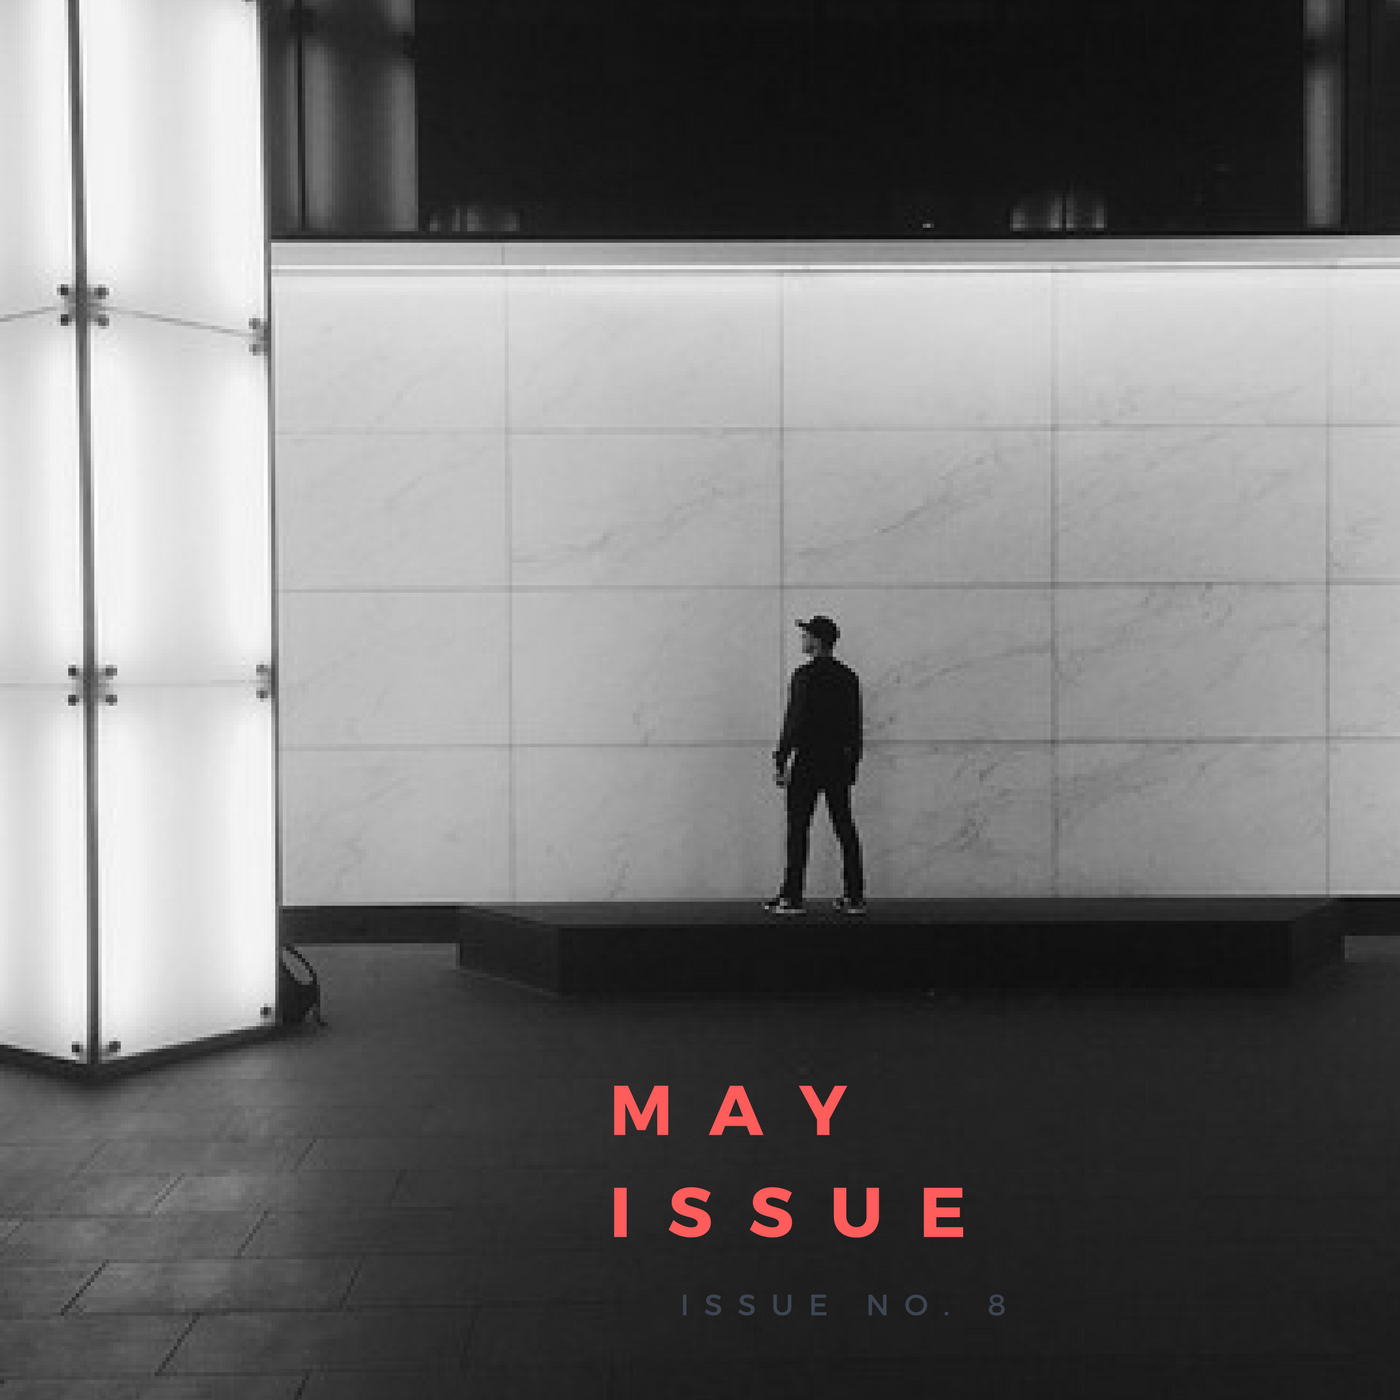 MAY 16 ISSUE   Justin Milhouse   Brynn W. Casey   Matthew Pastula   Quintin Banks   Aime Leon Dore   The New Shade of Black  The Arthouse  Brandon Haynes   Pintrill